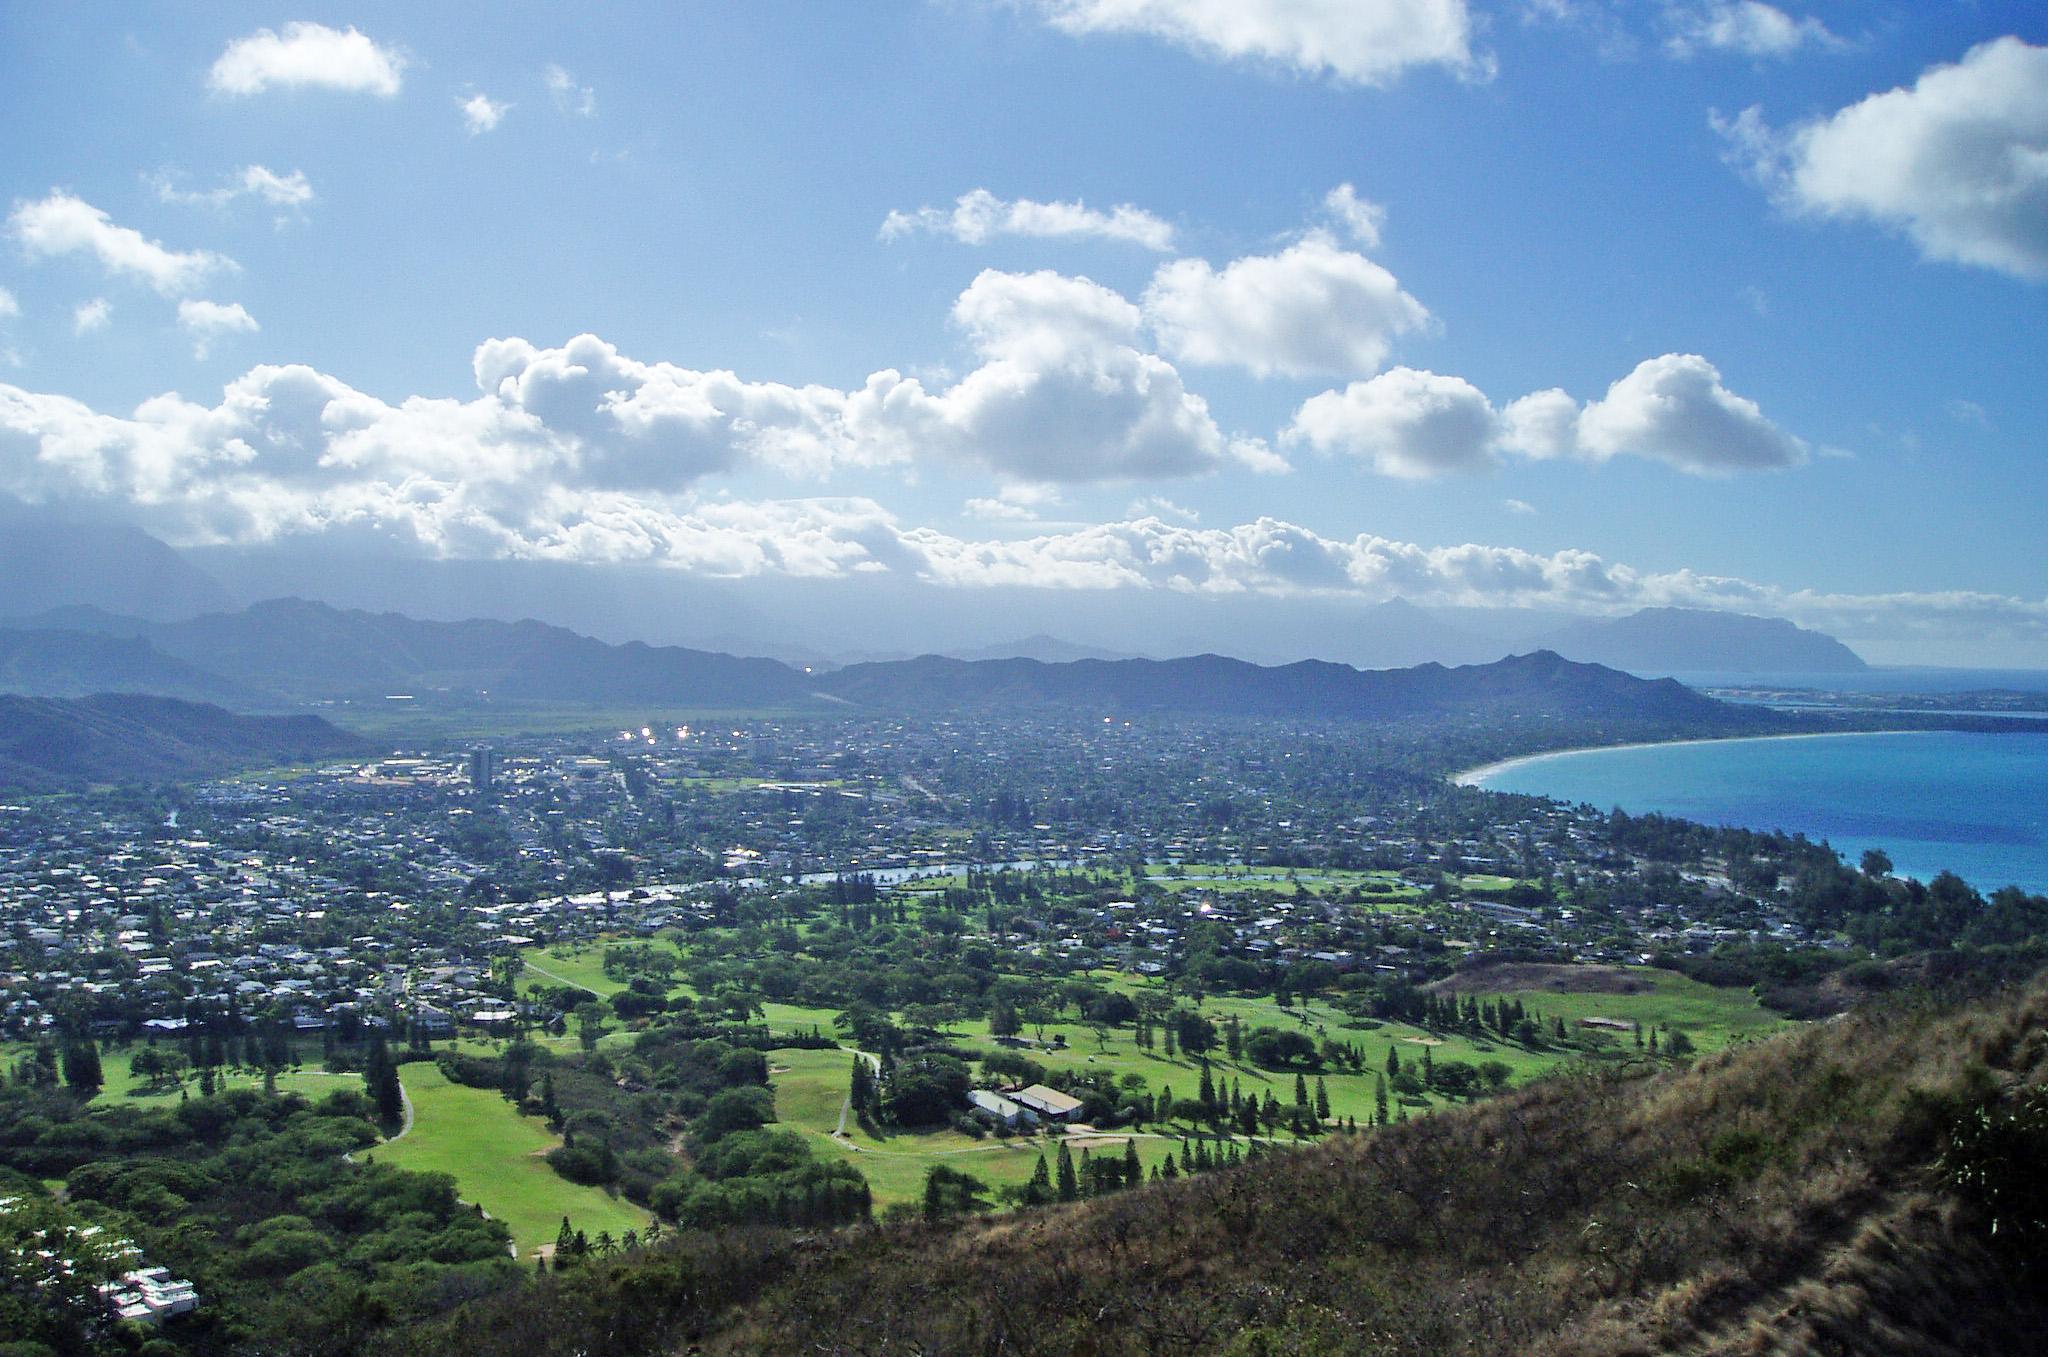 Contea Di Honolulu Hawaii file:kailua oahu - wikimedia commons